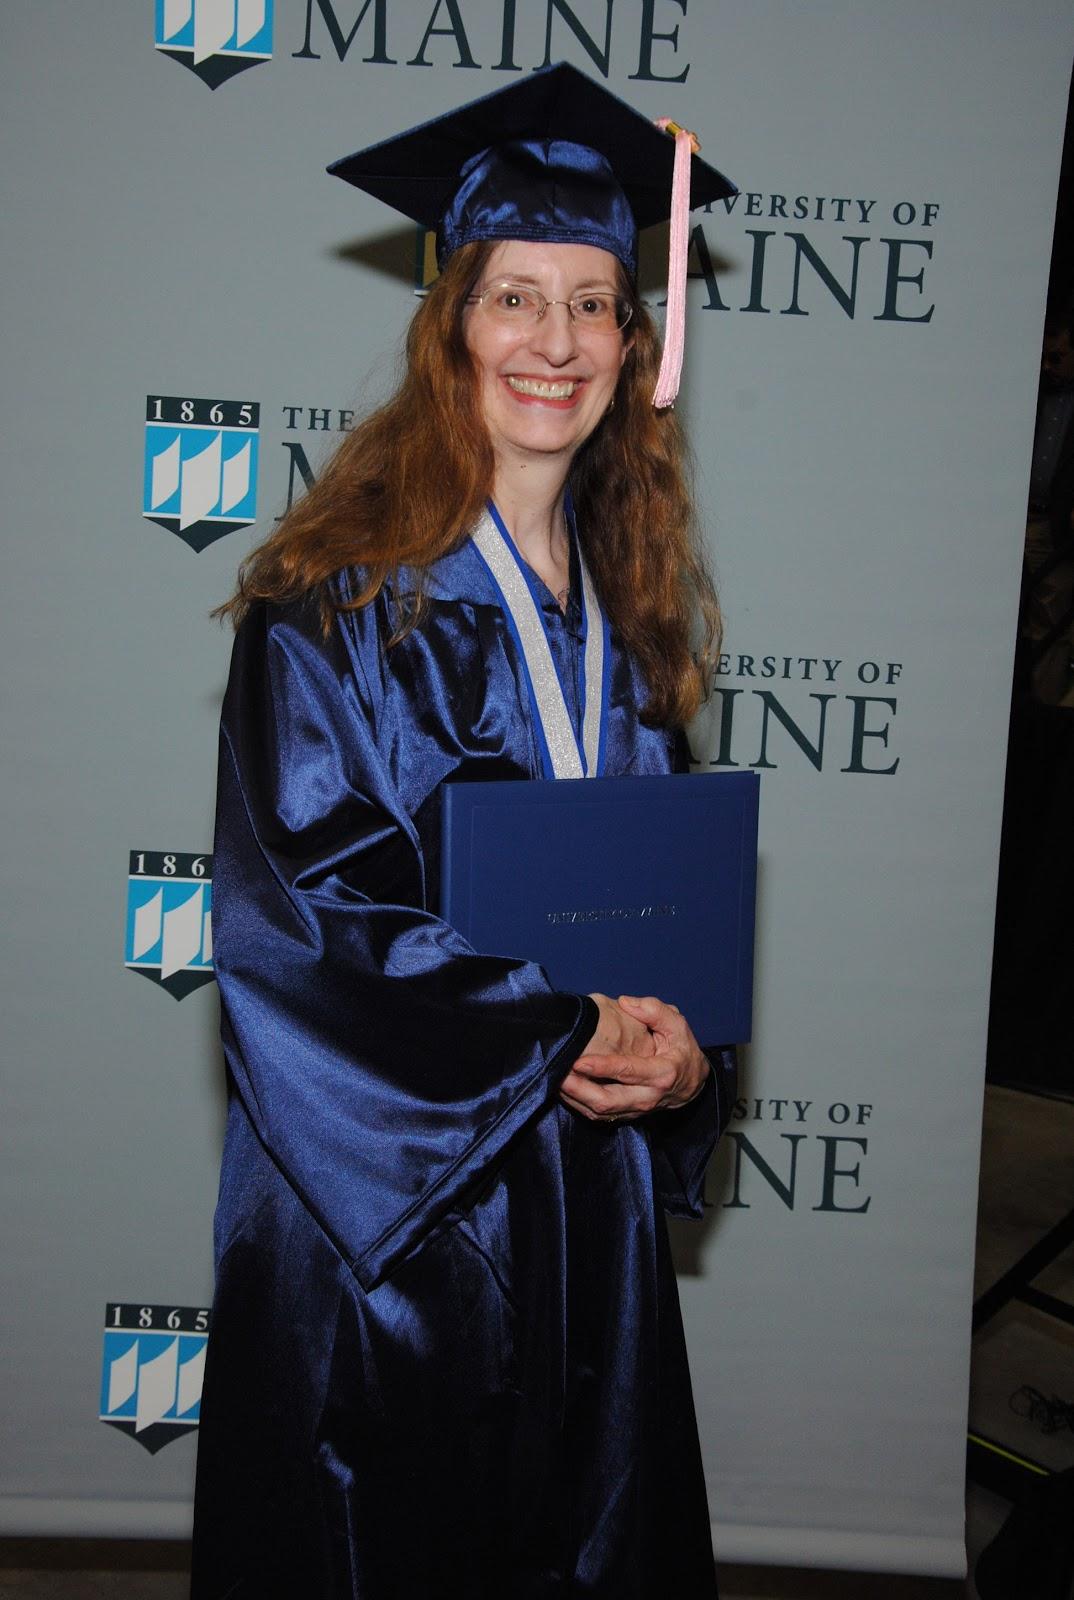 2016 05 14 Cathy diploma.jpg